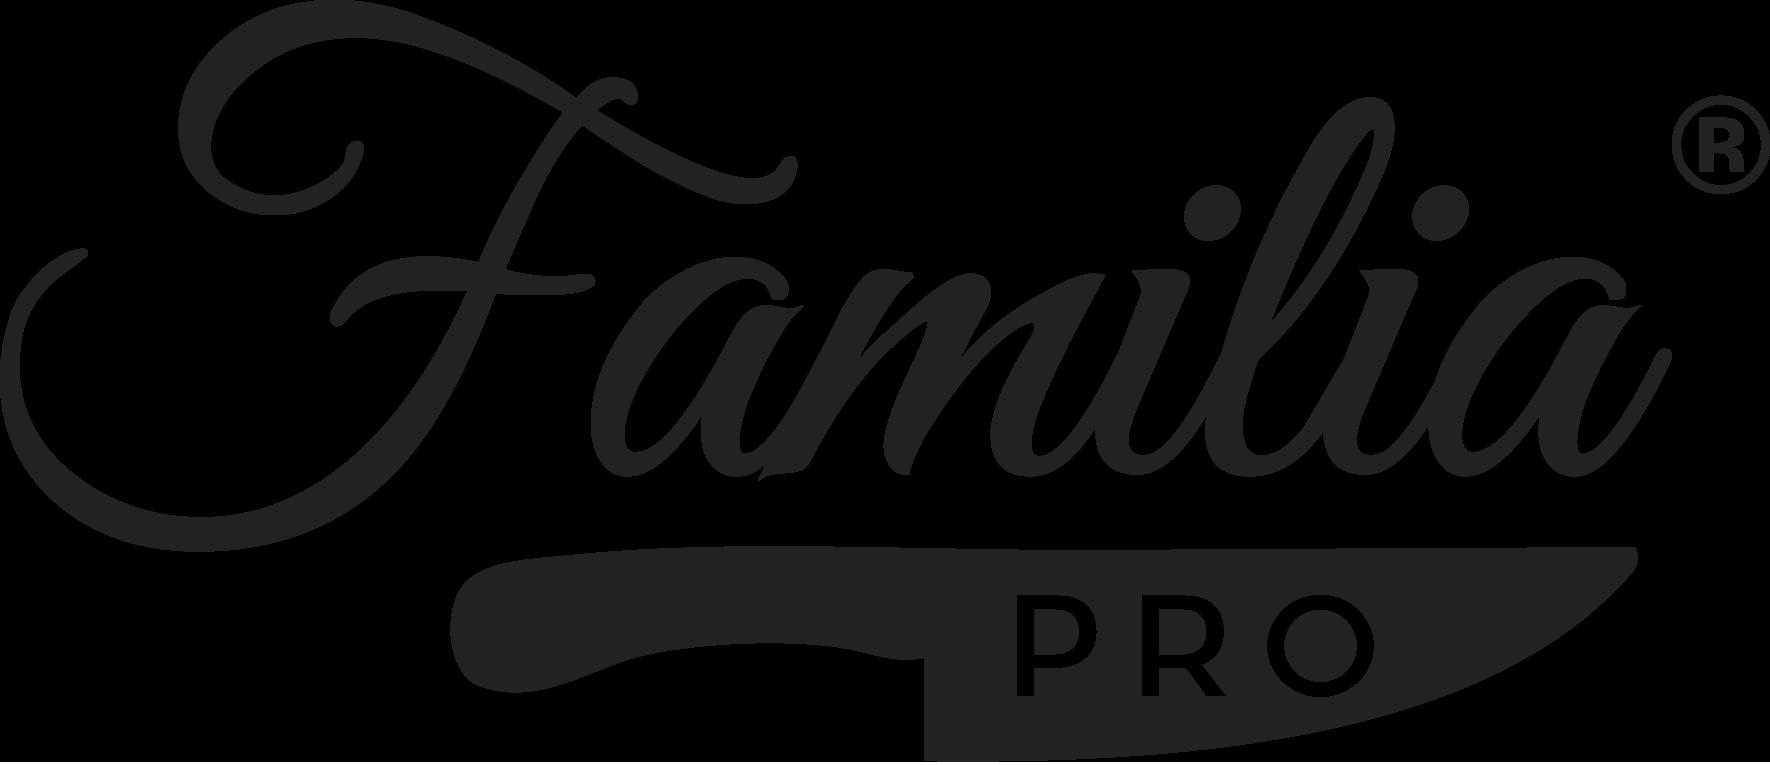 Familia_Pro_logo_musta.png